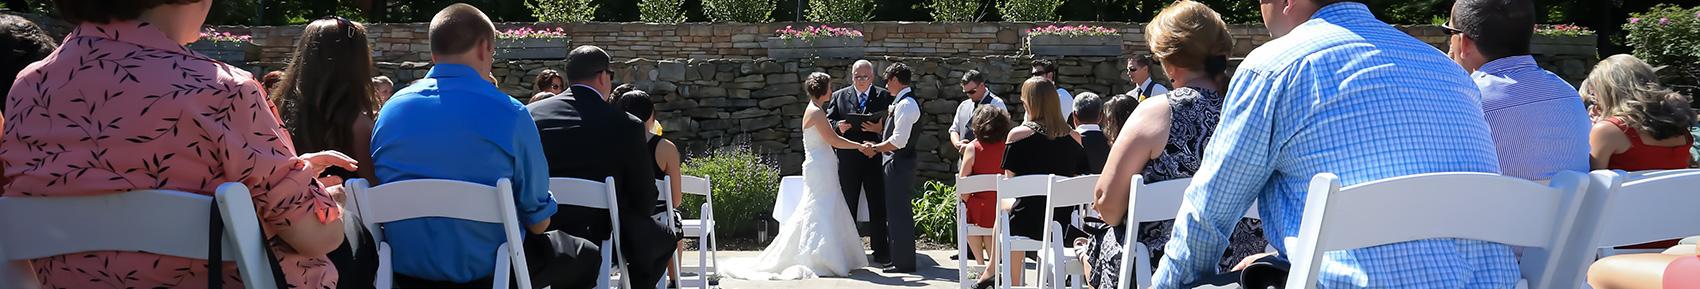 wedding-heading-2